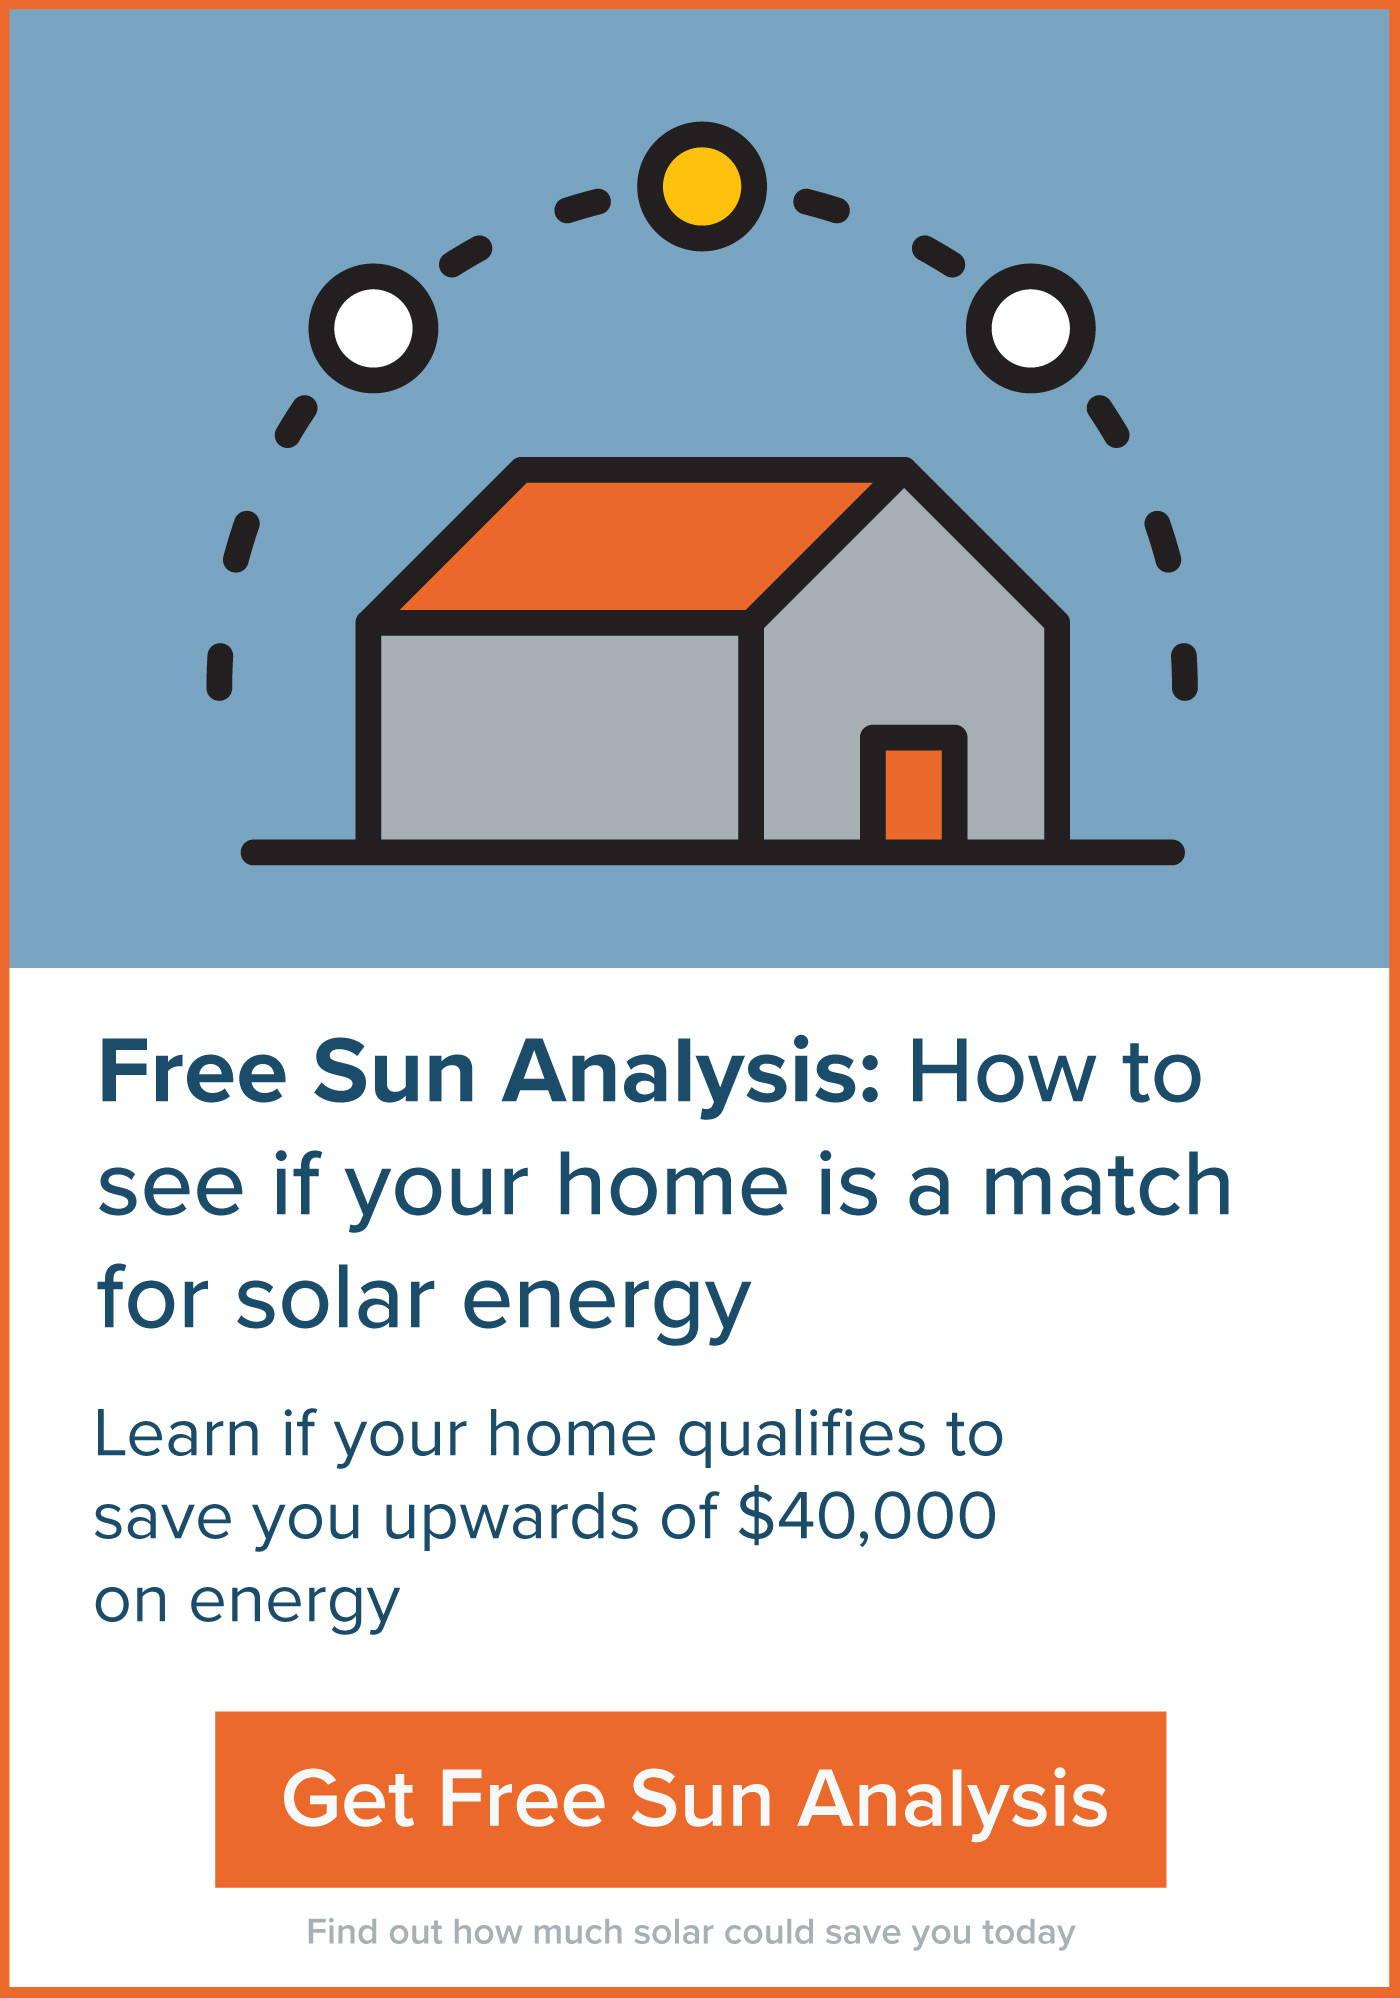 Free Sun Analysis